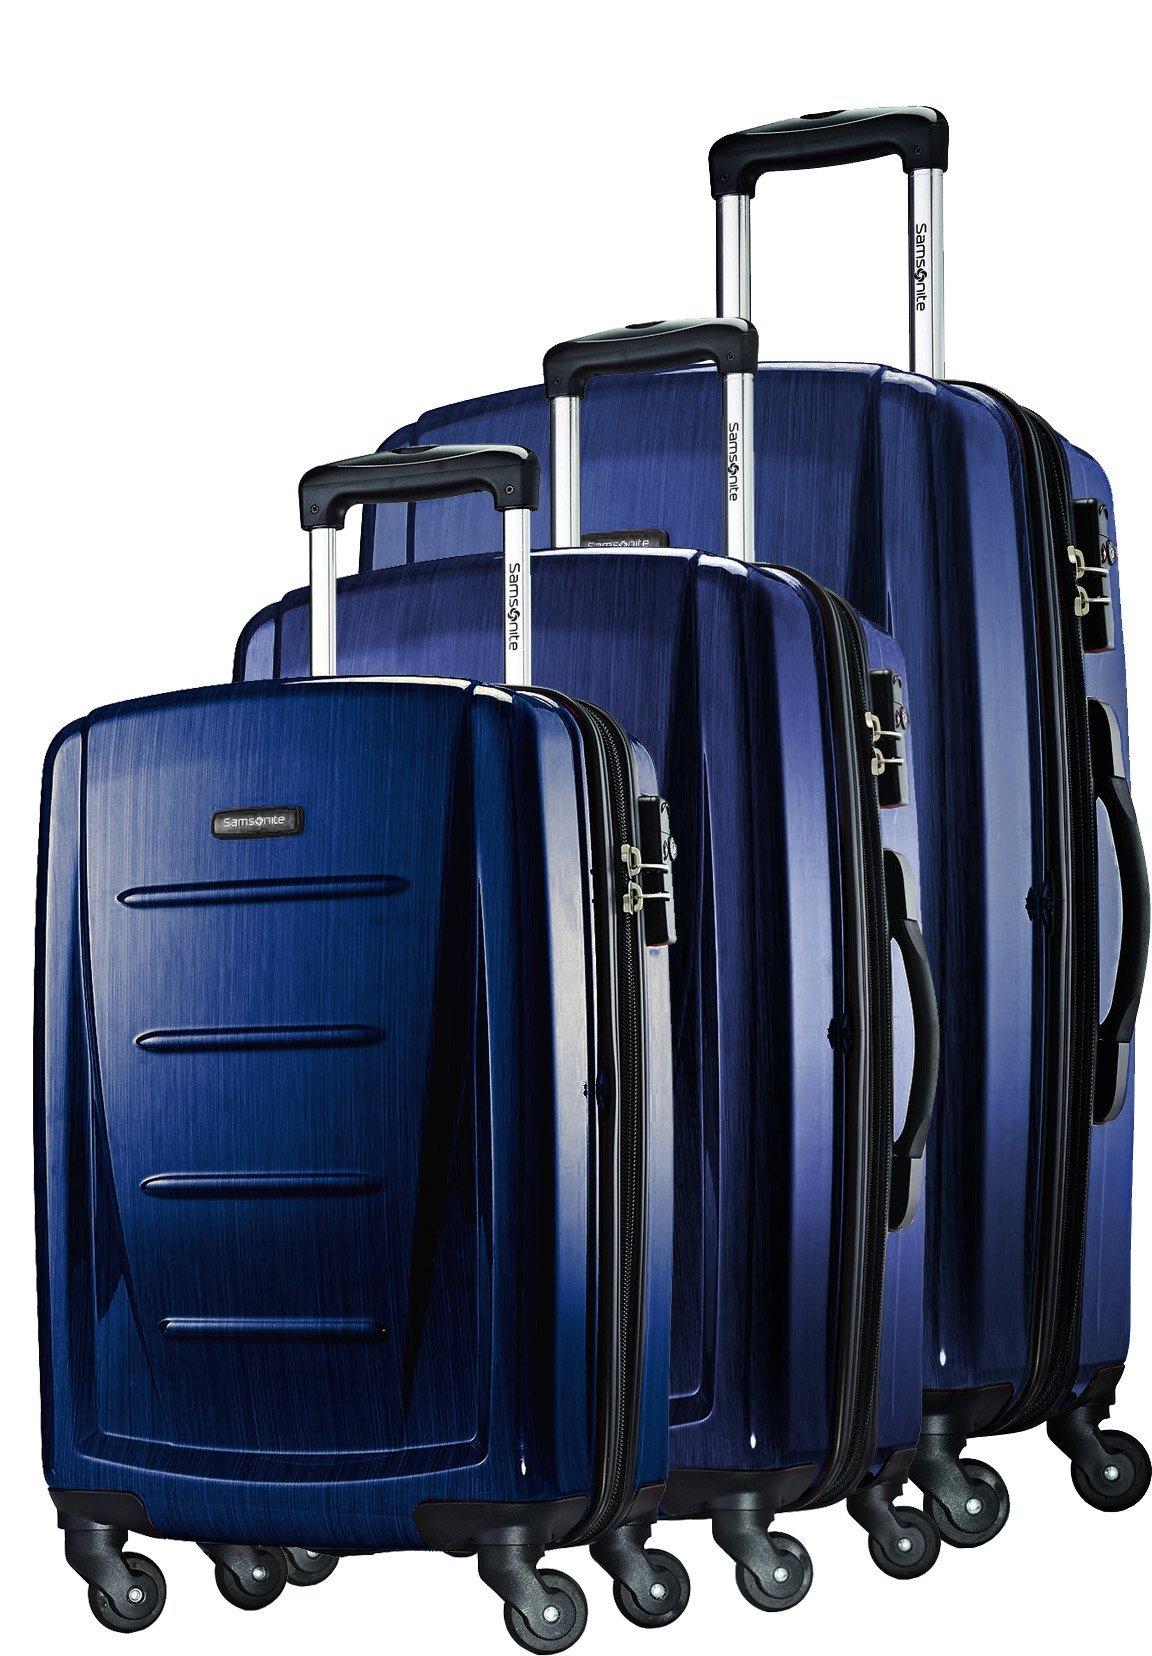 Samsonite Winfield 2 Hardside Luggage